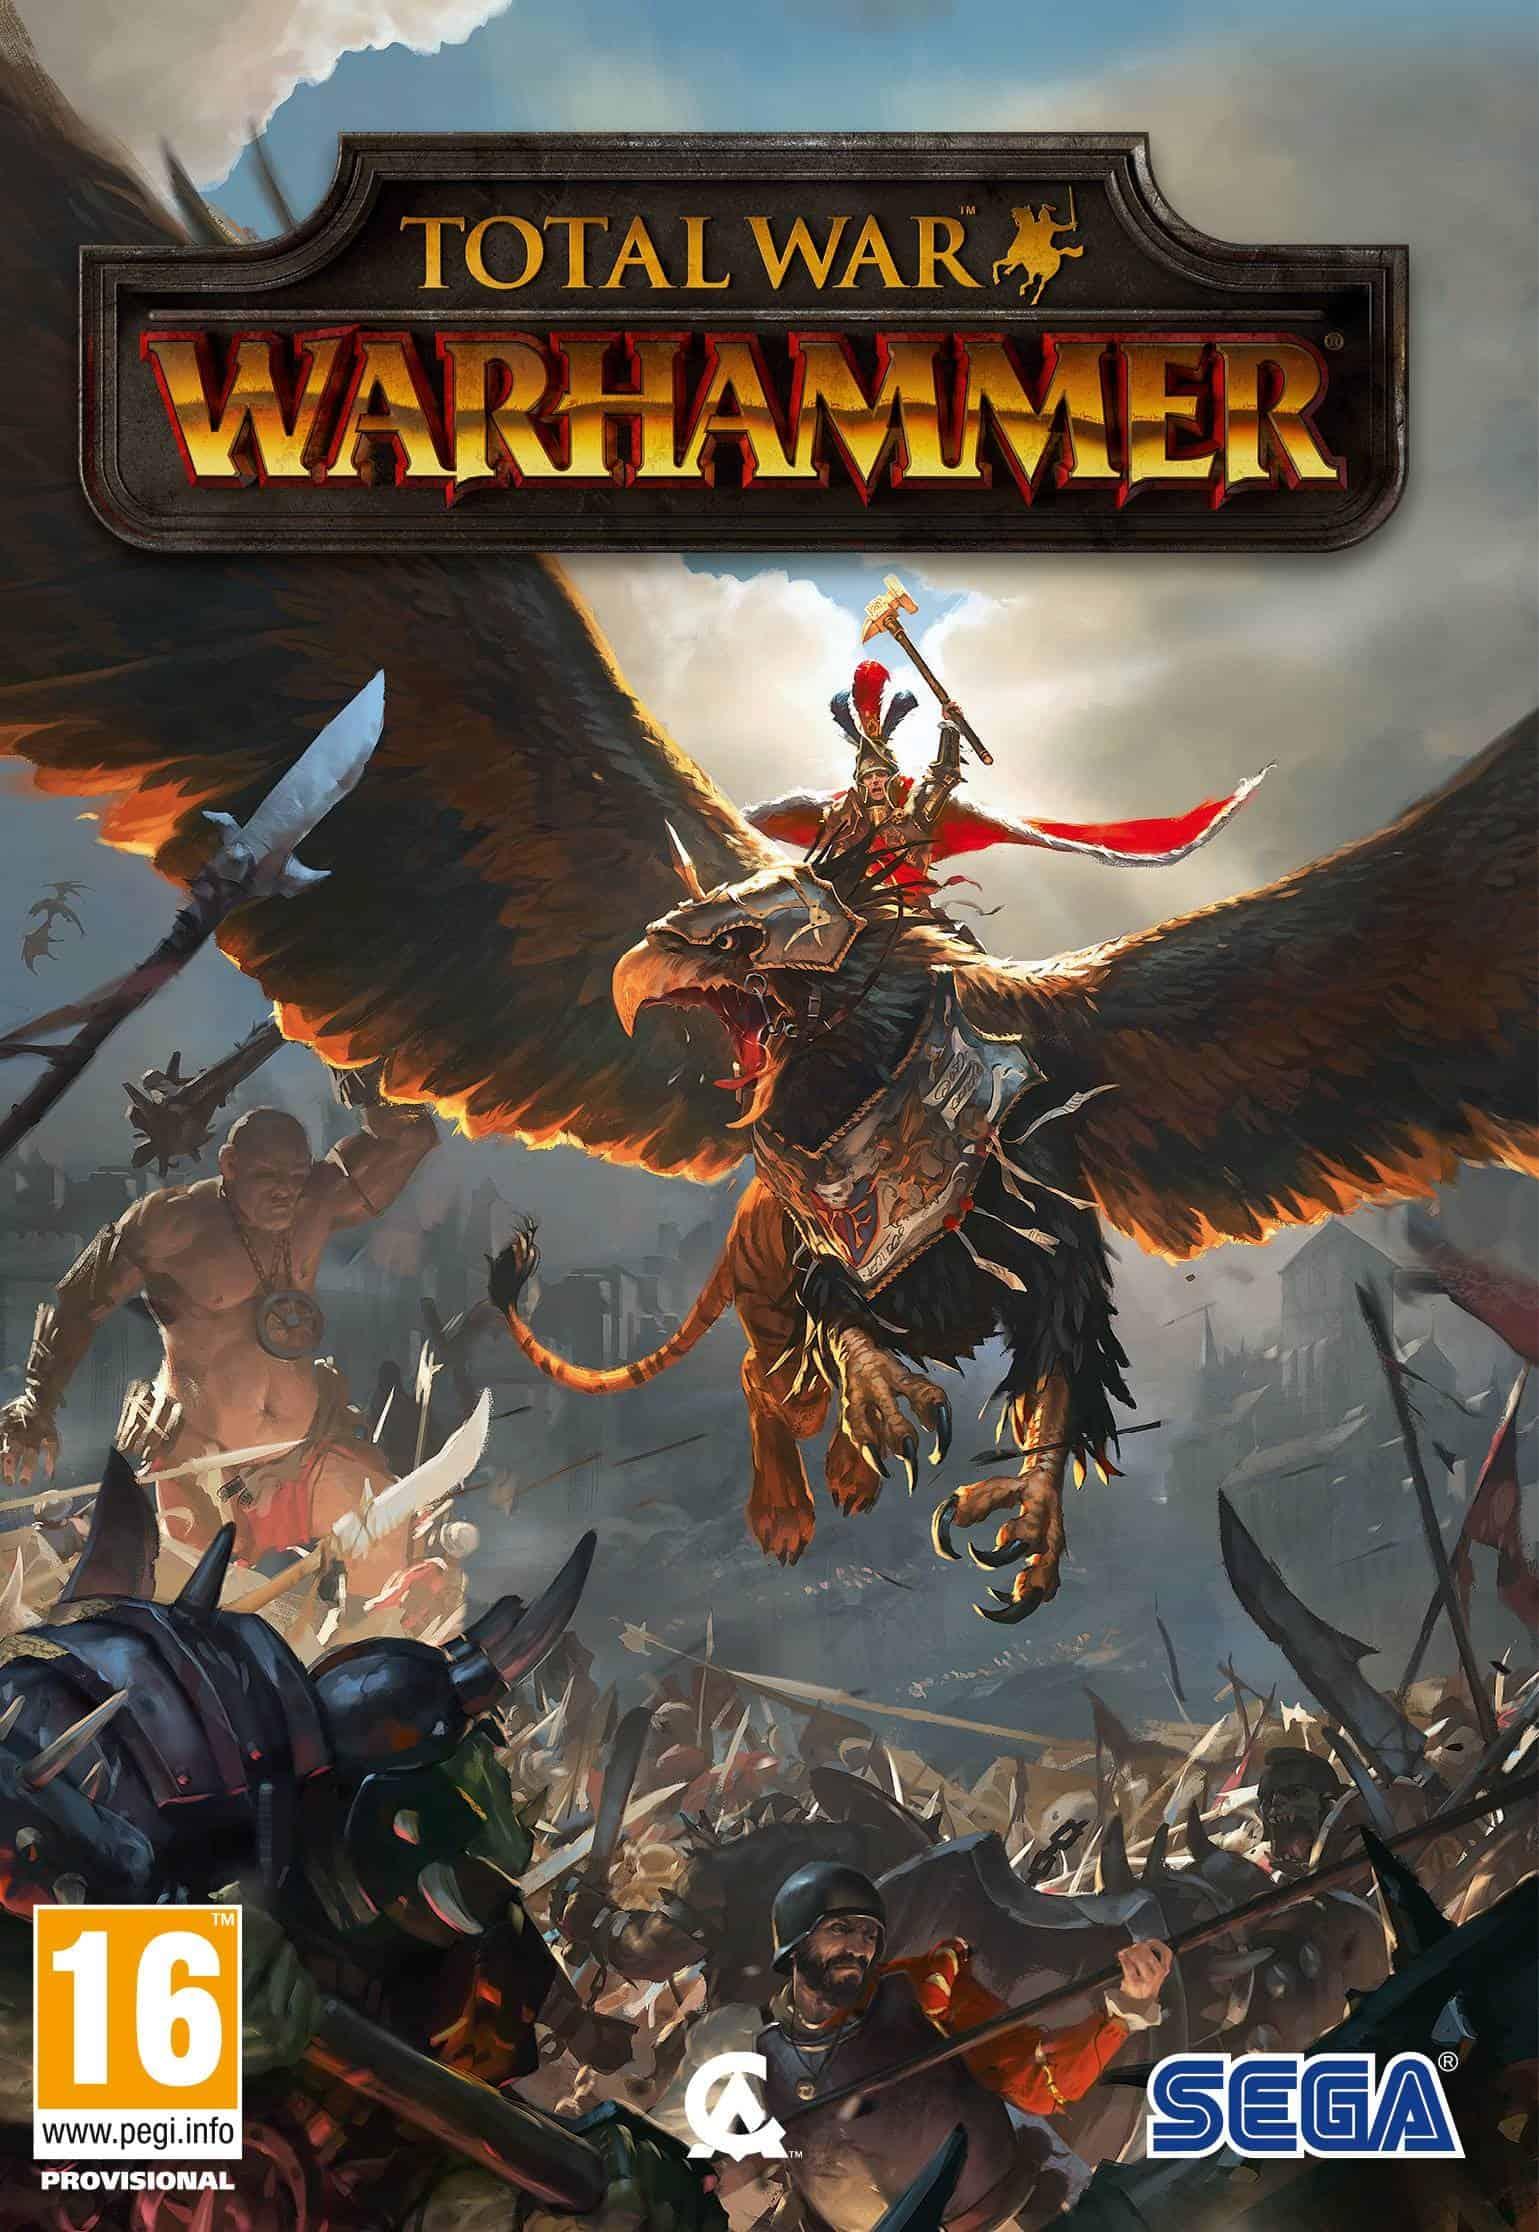 Total War Warhammer cover